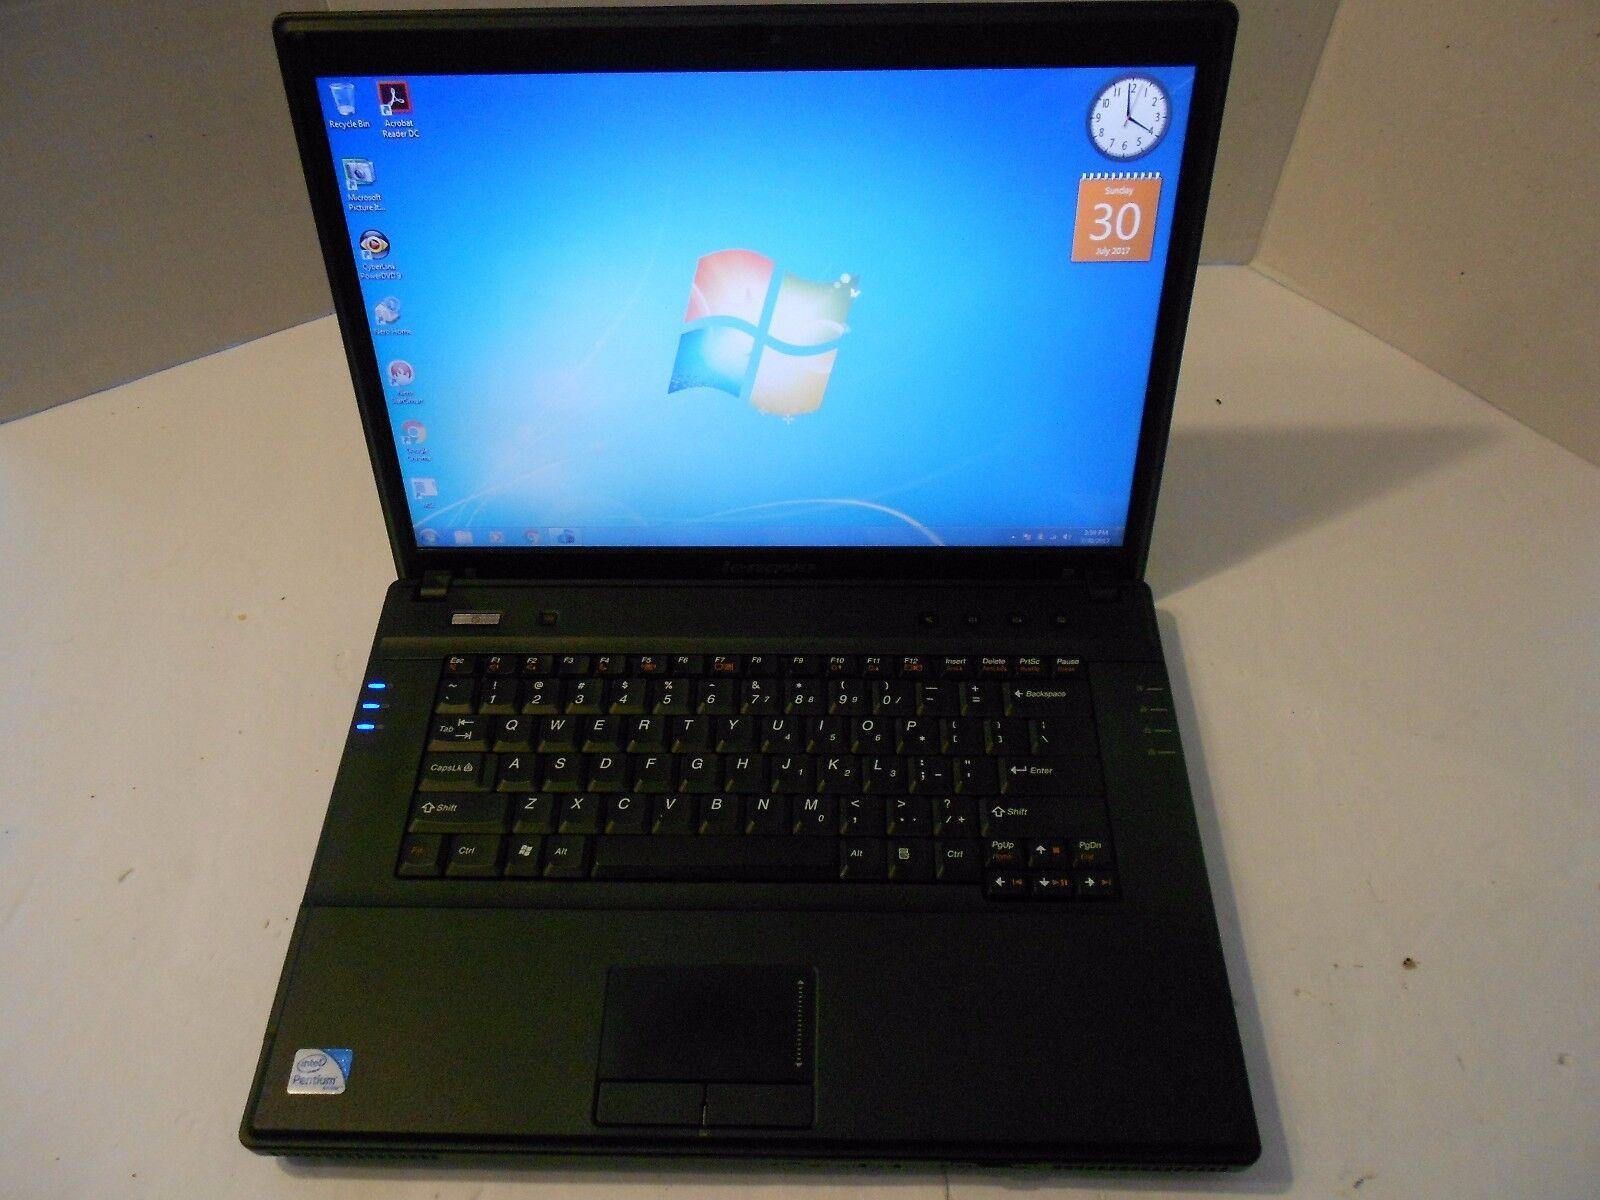 LENOVO 3000 G530 CORE 2 DUO T6600 2.2GHz 3GB RAM 250GB HDD WINDOWS7 OFFICE13